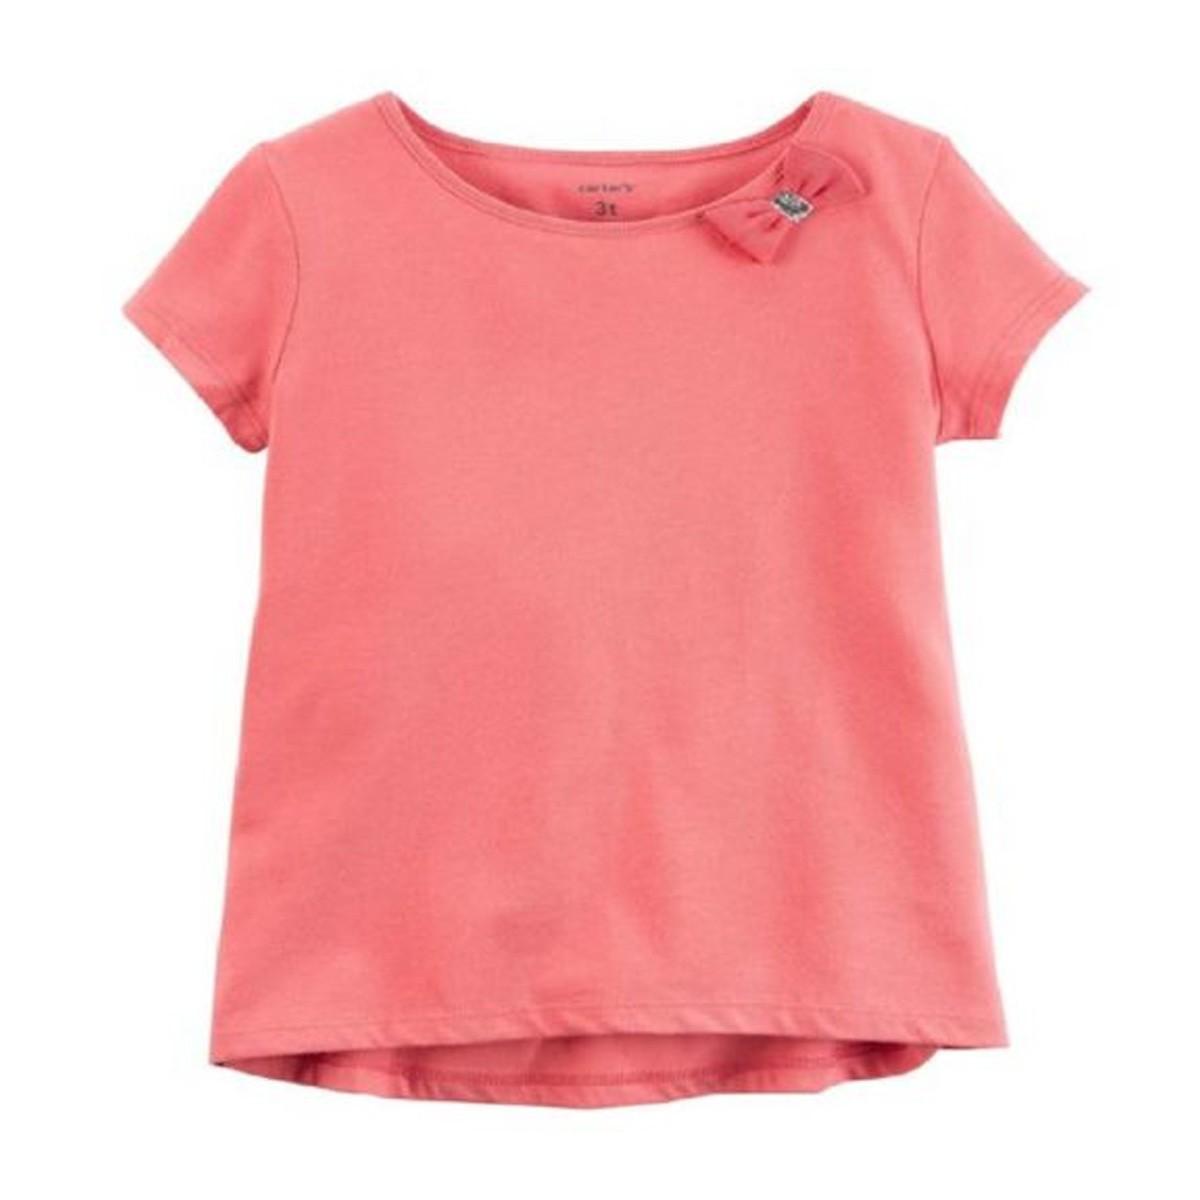 Camiseta Manga Curta Rosa Carter´s- Tamanho 3t